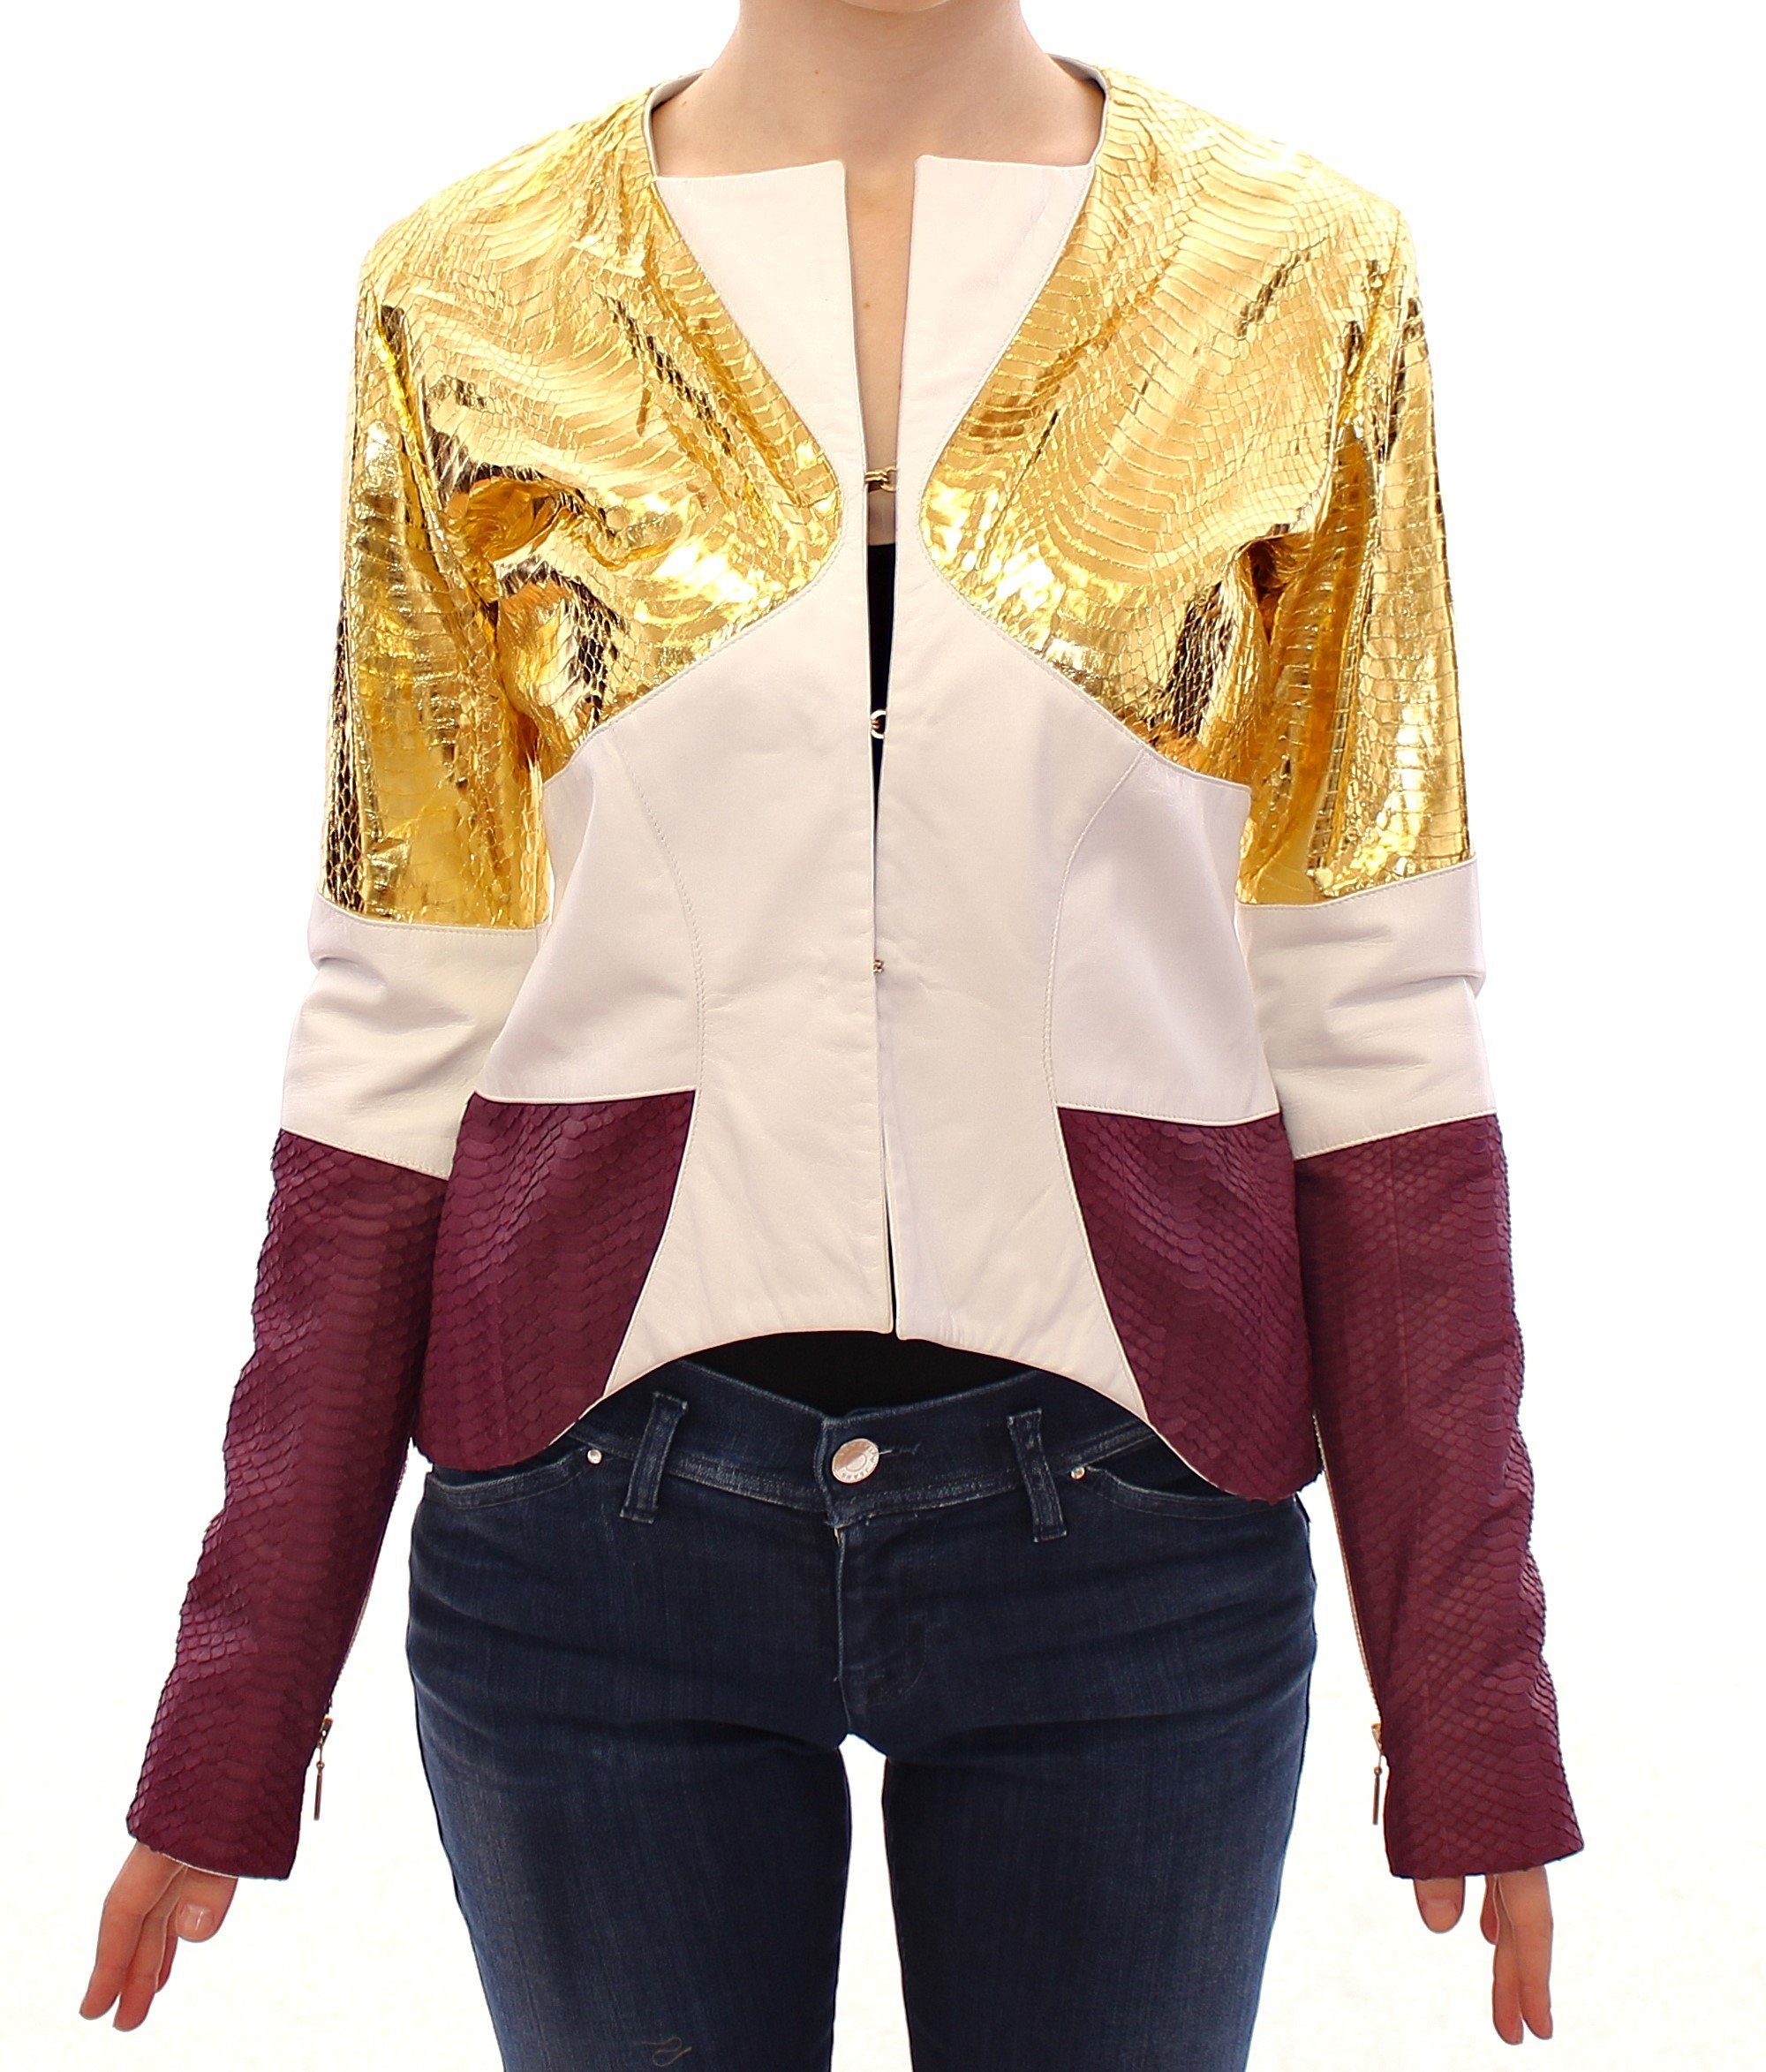 Vladimiro Gioia Women's Leather Jacket White GSS10678 - IT40|S